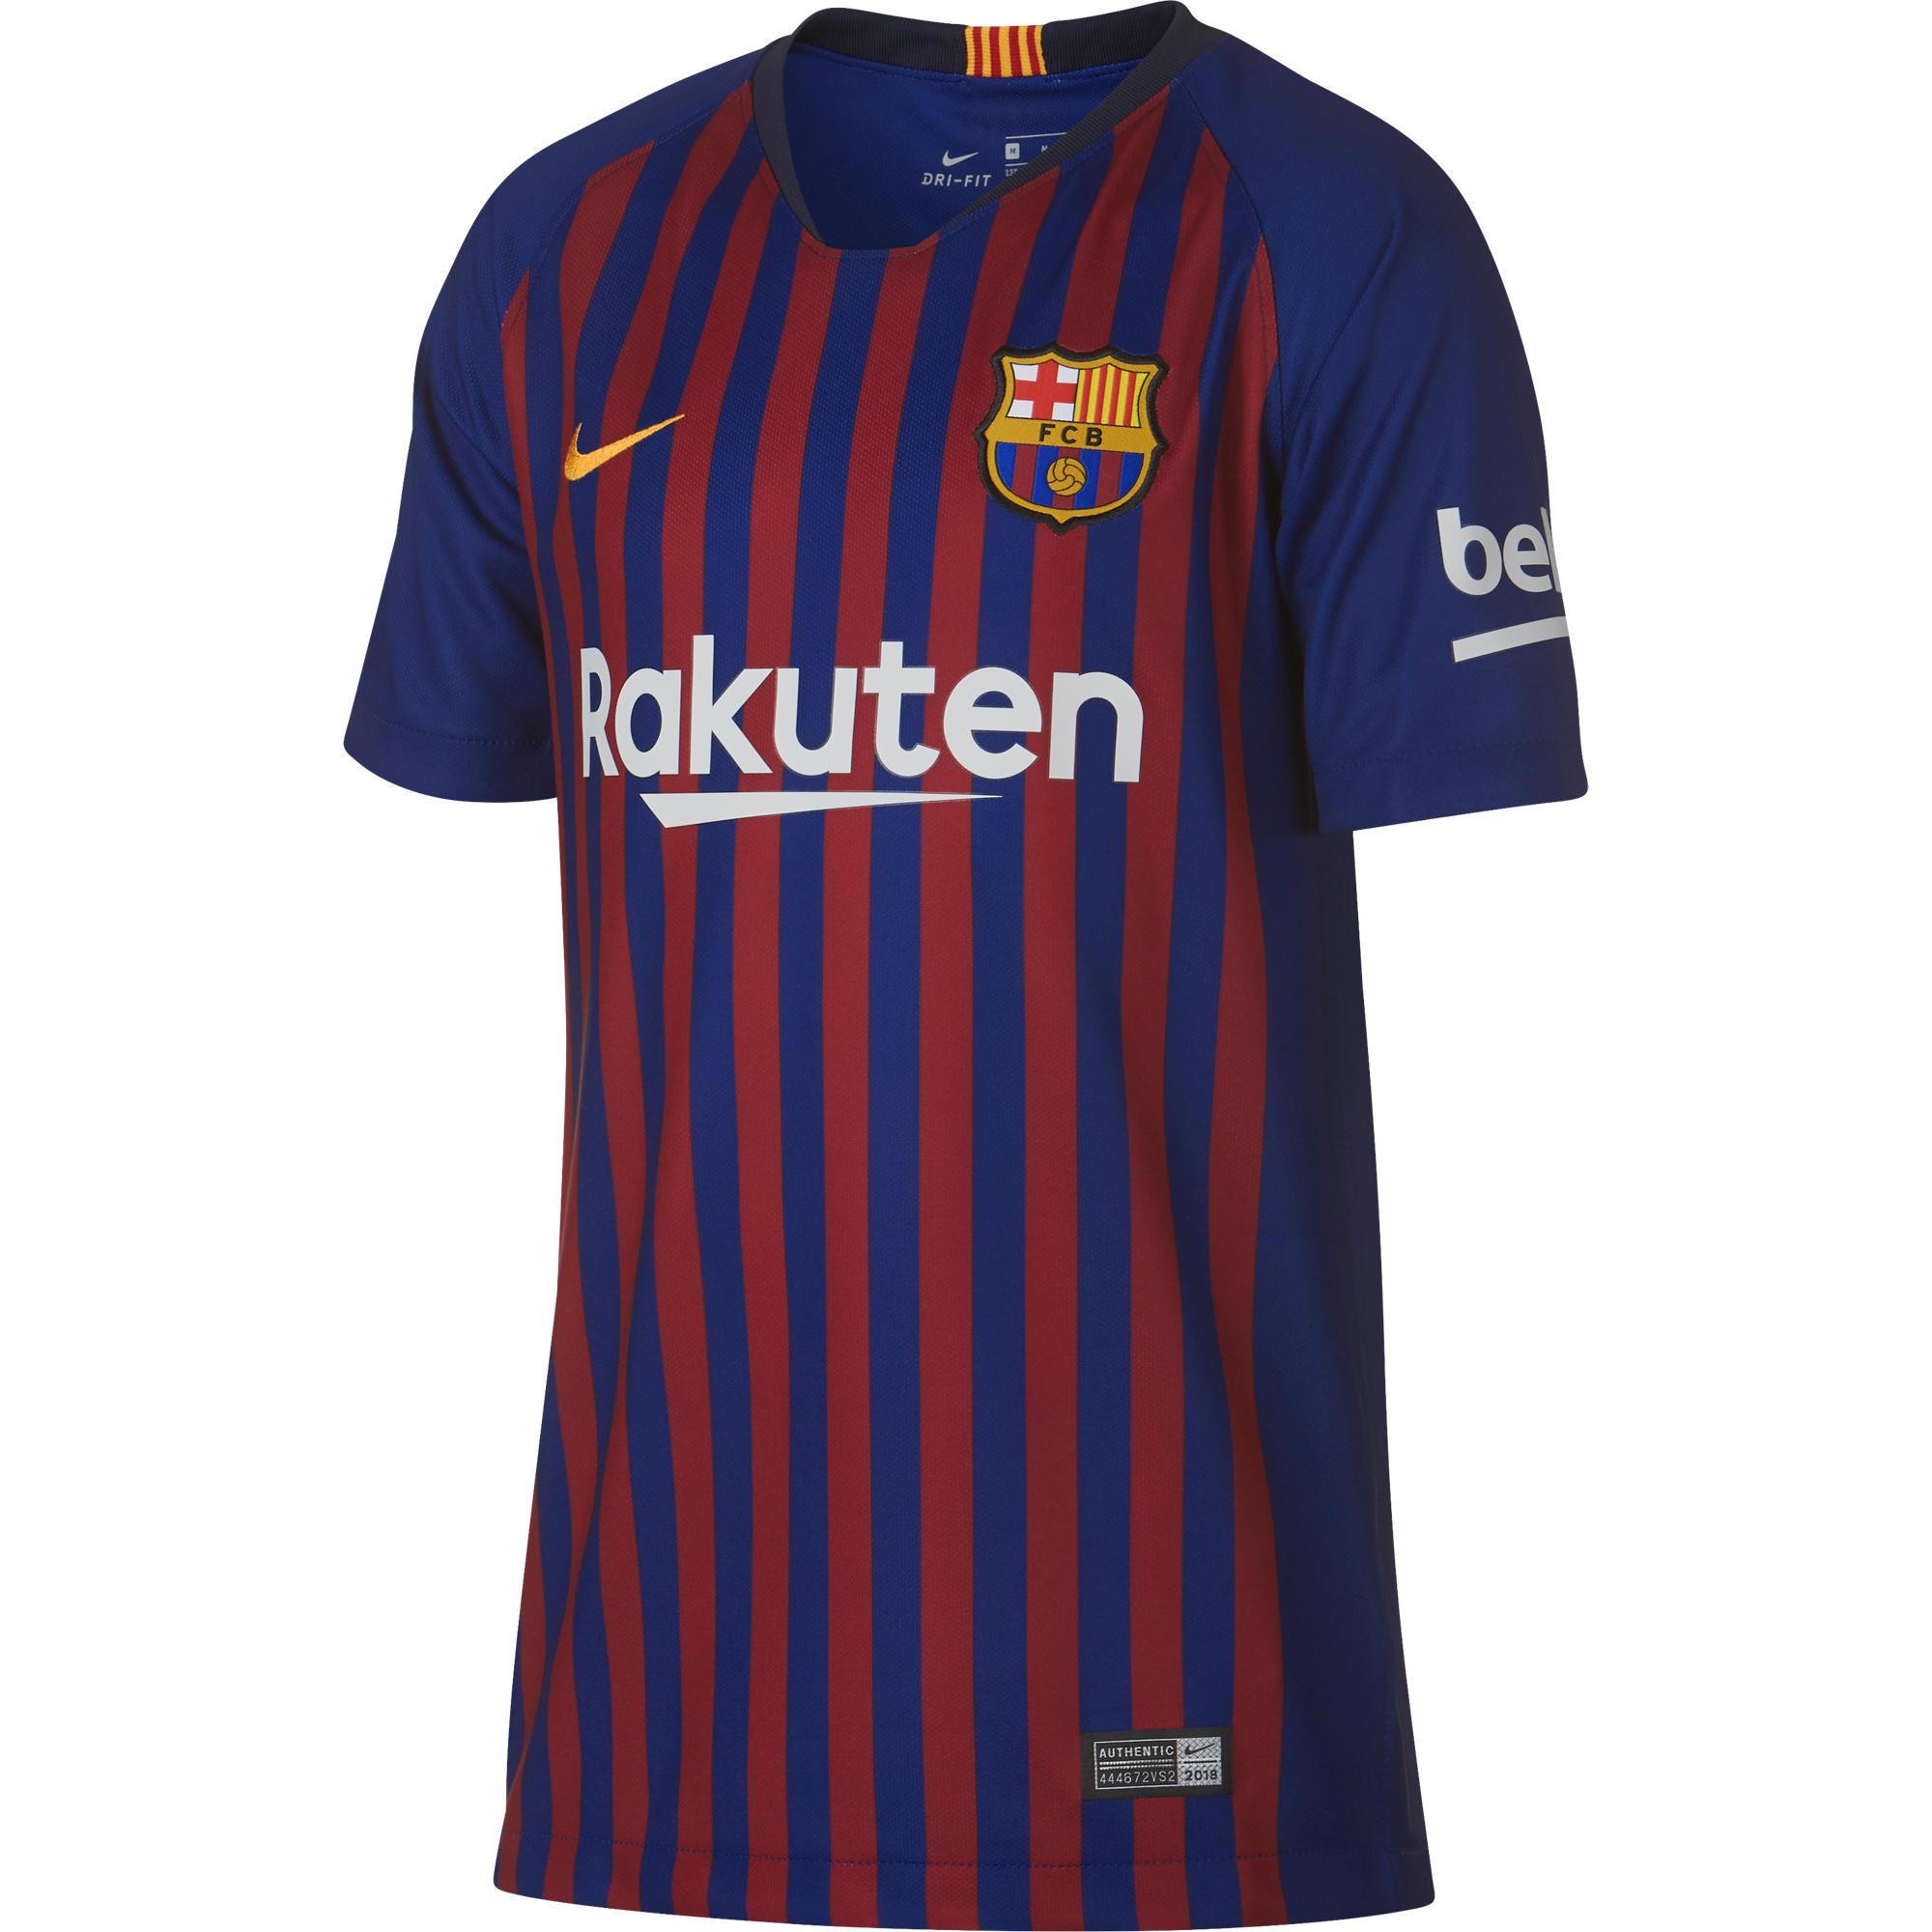 95699c973d08c Camiseta de Fútbol Nike oficial F.C. Barcelona 1ª equipación hombre  2018 2019